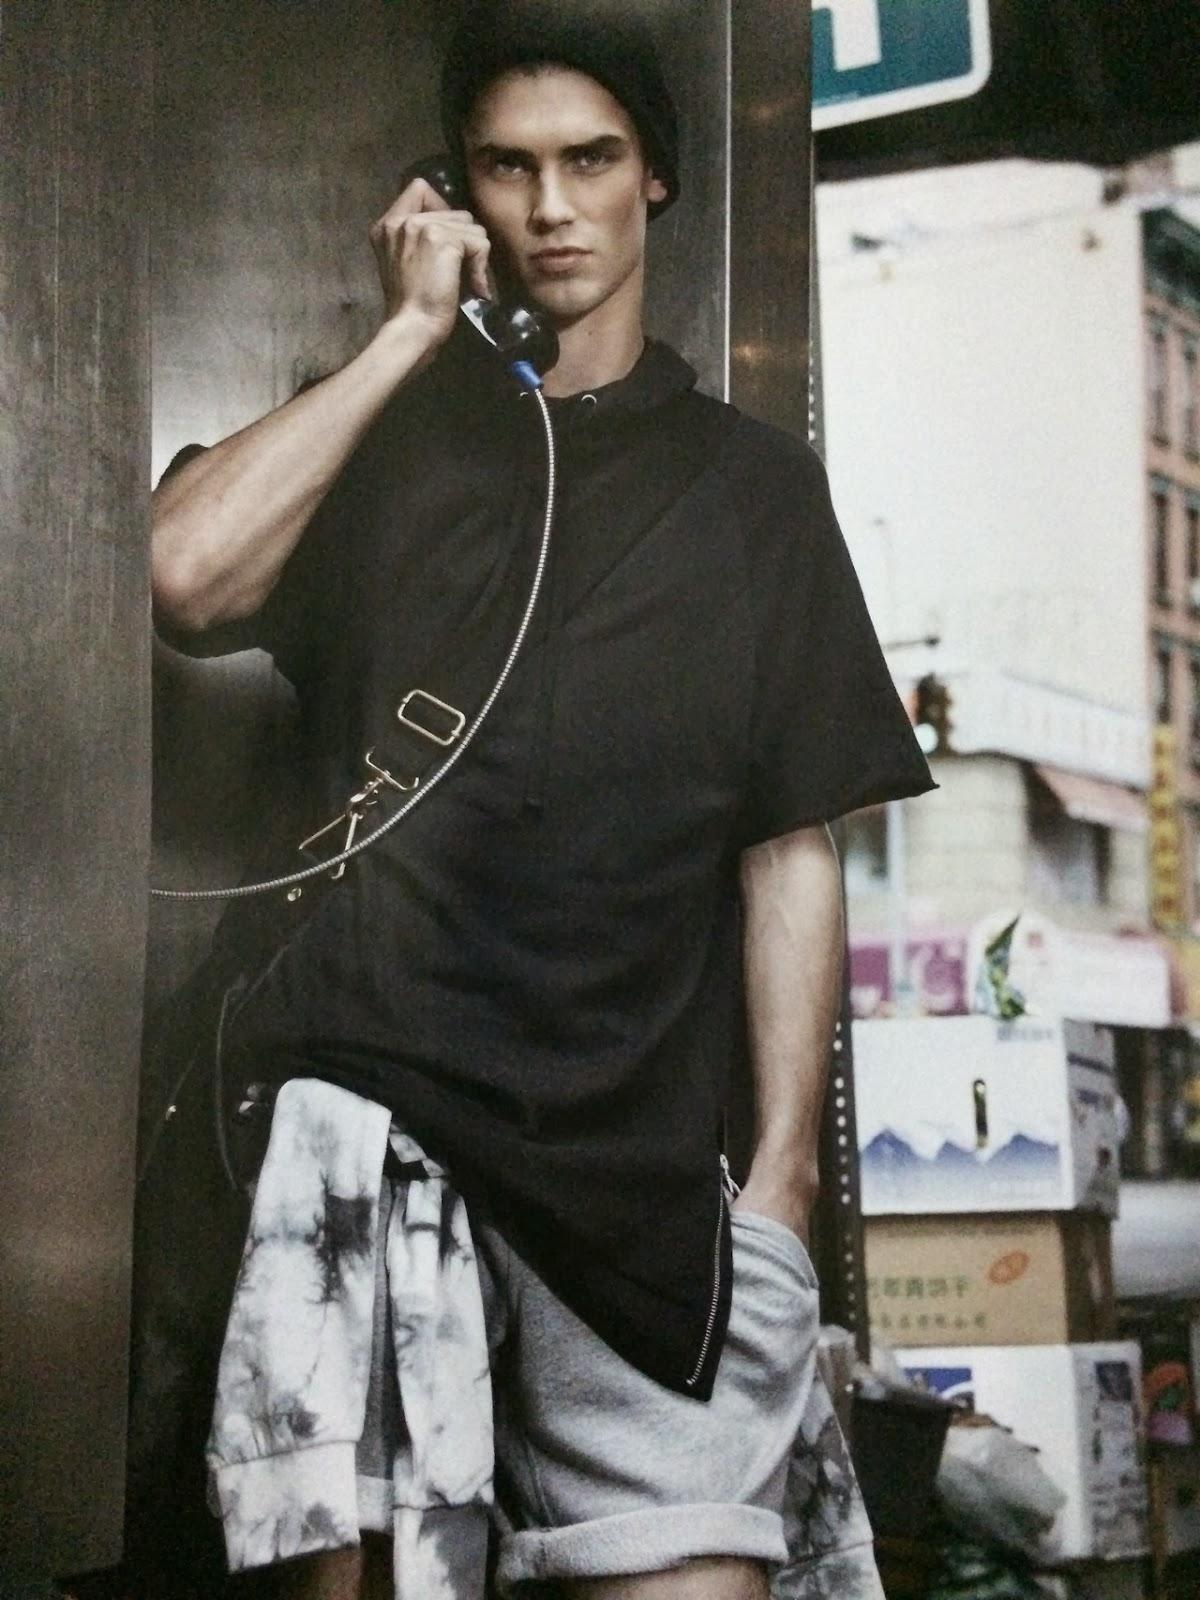 ARTHUR G. (MAJOR MODEL) para H&M Magazine 4 ARTHUR G. (MAJOR MODEL) para H&M Magazine